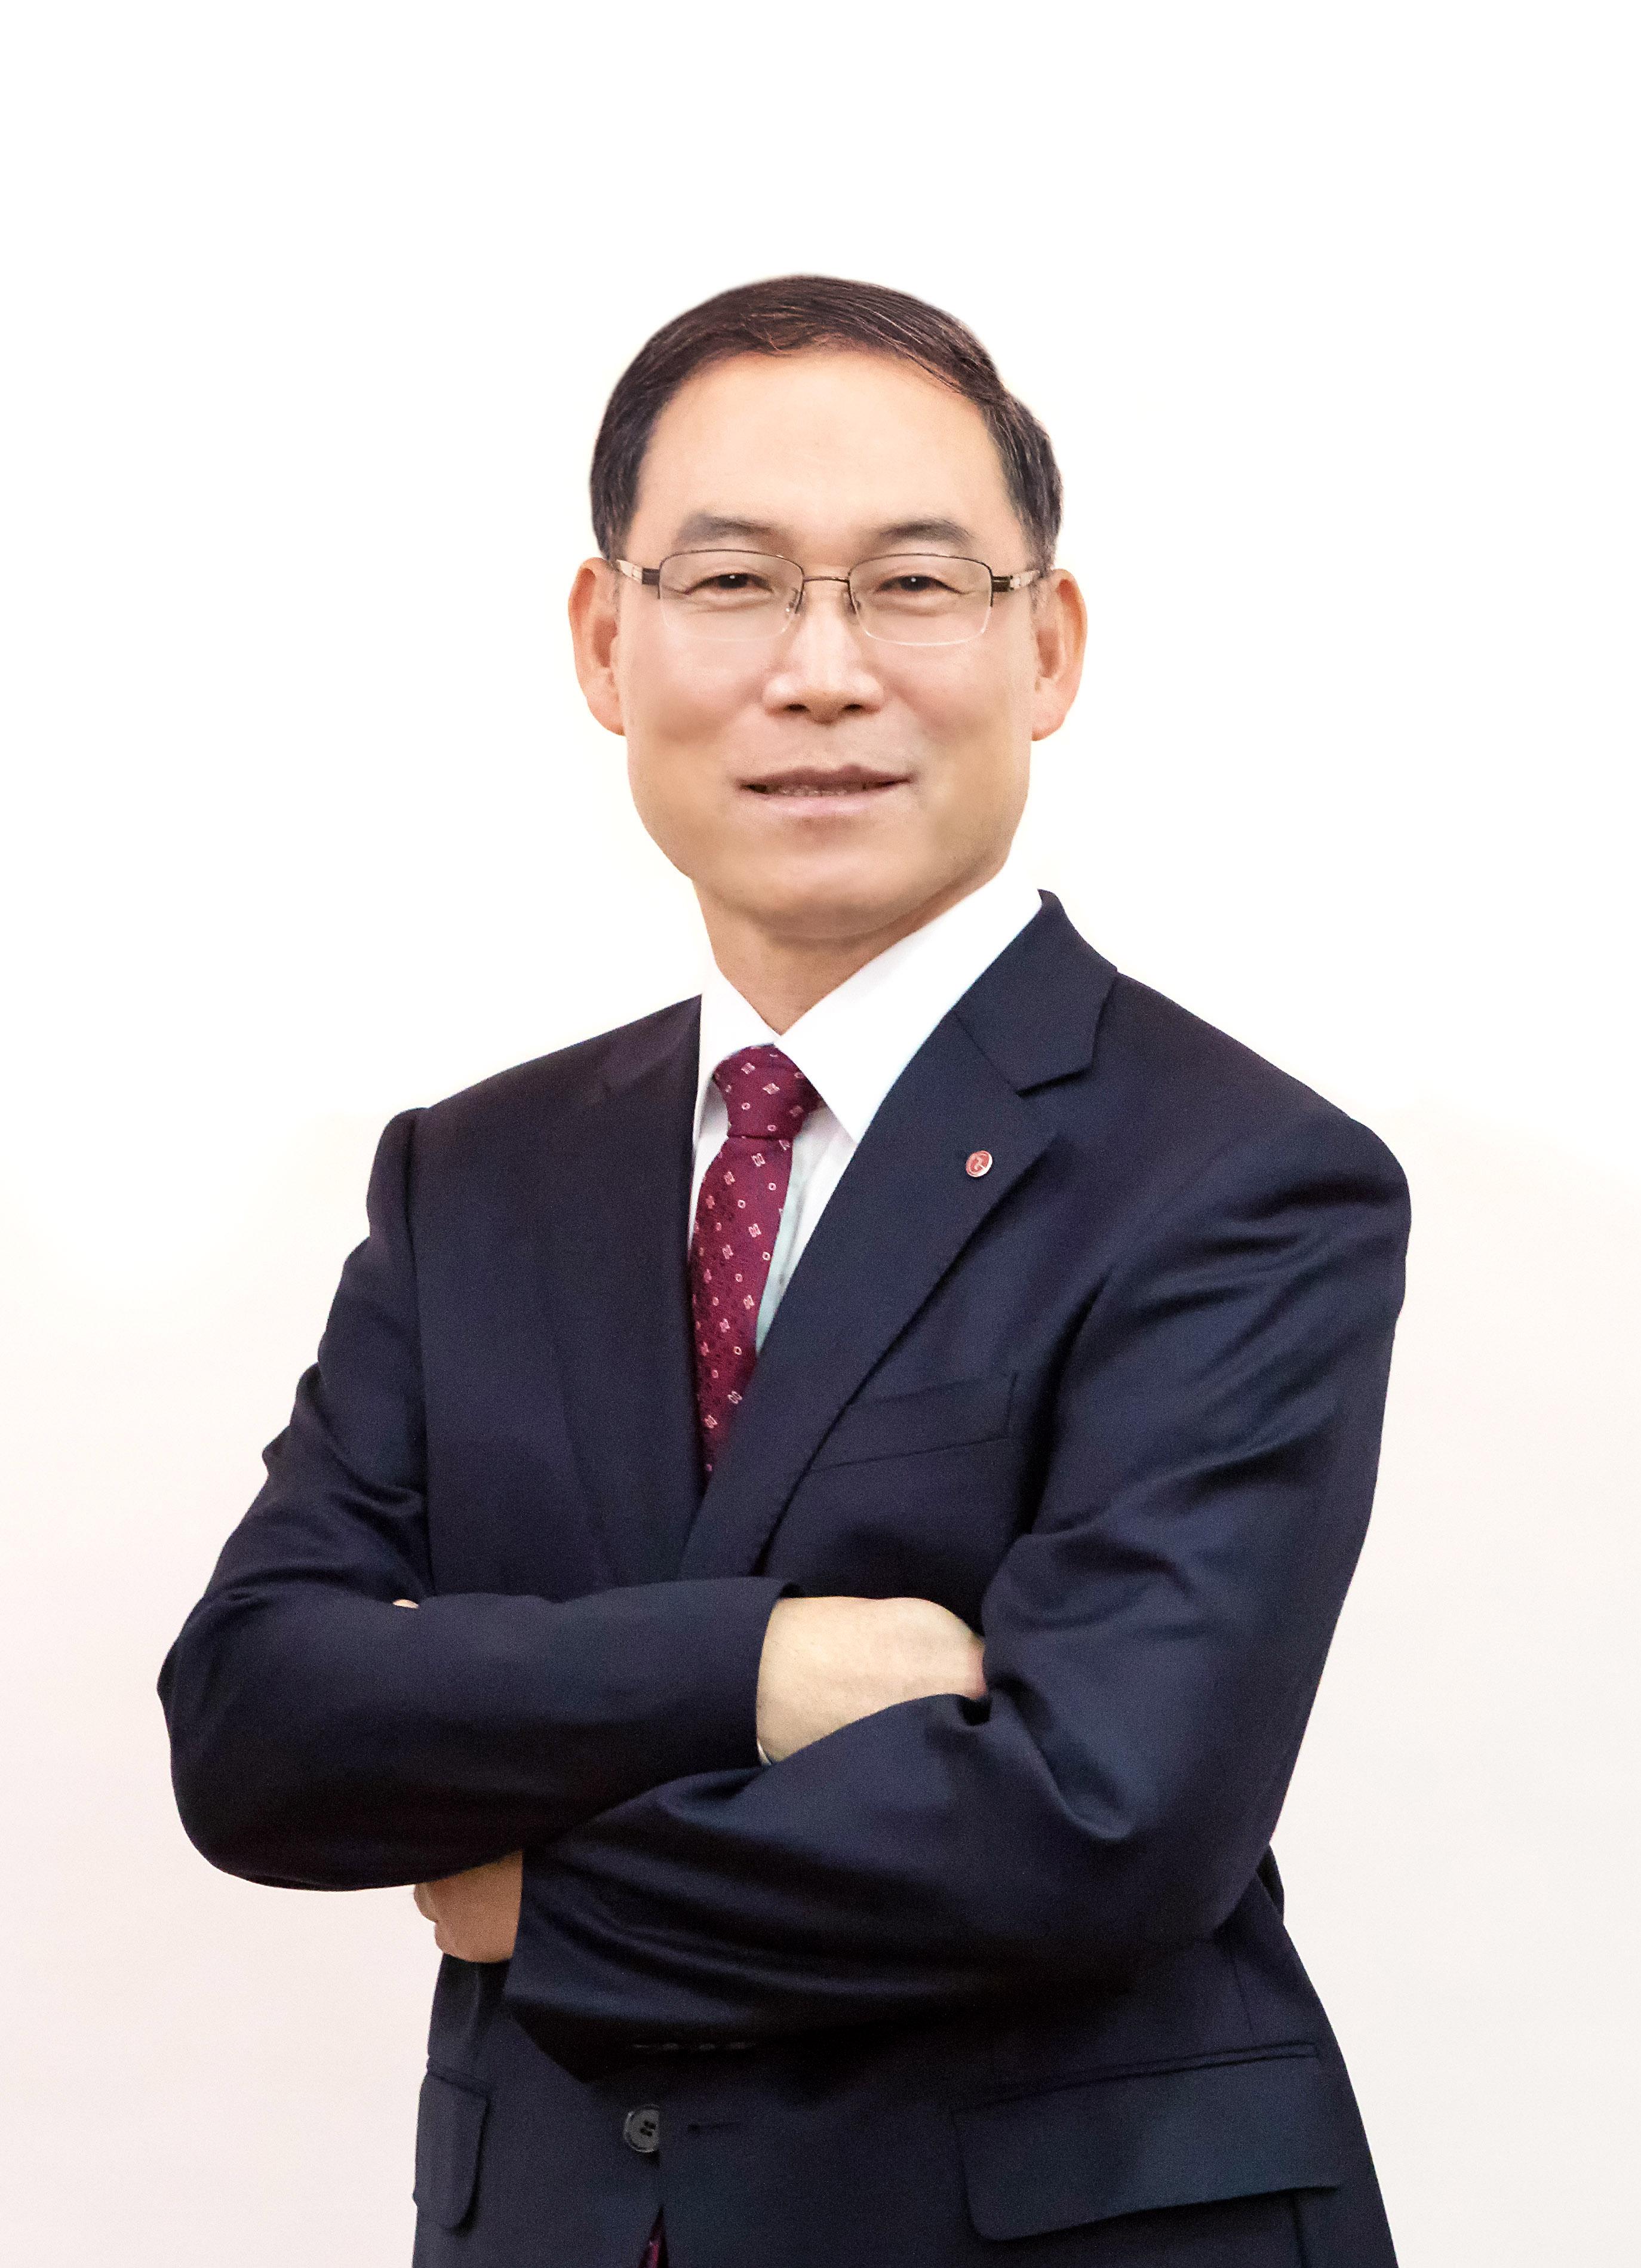 LG전자 H&A사업본부장 송대현 사장이 24일 '제 13회 전자 IT의 날' 기념식에서 금탑산업훈장을 수상했다.